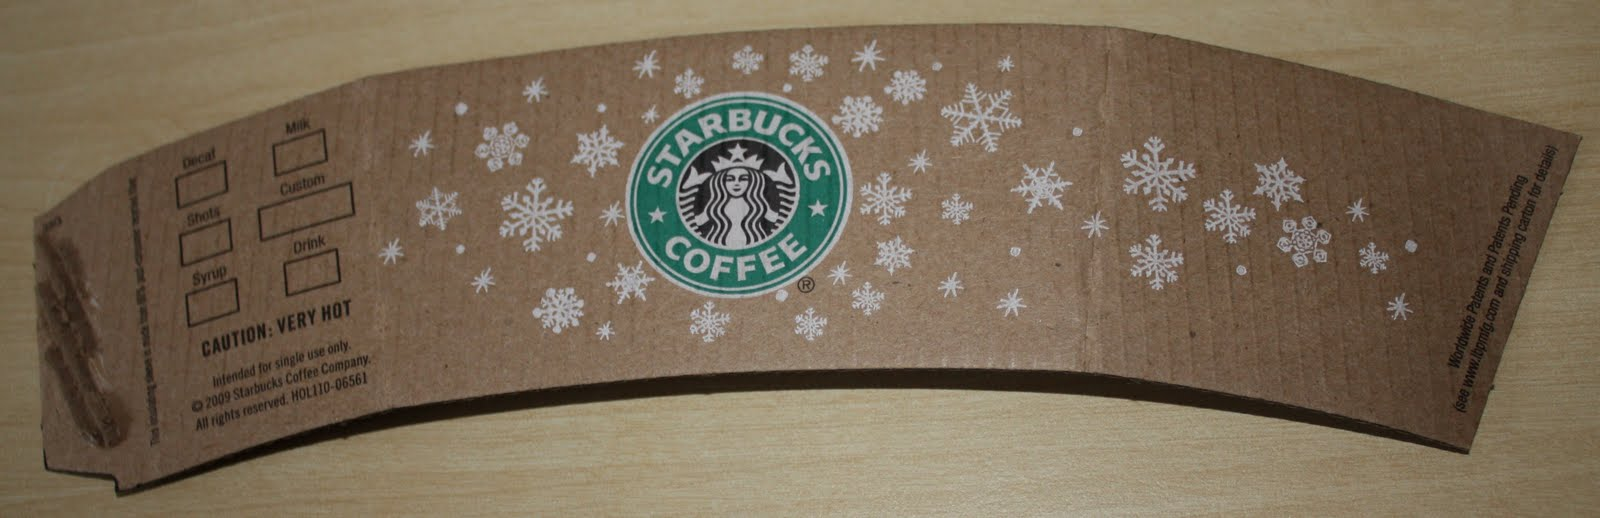 design context  starbucks cup holder